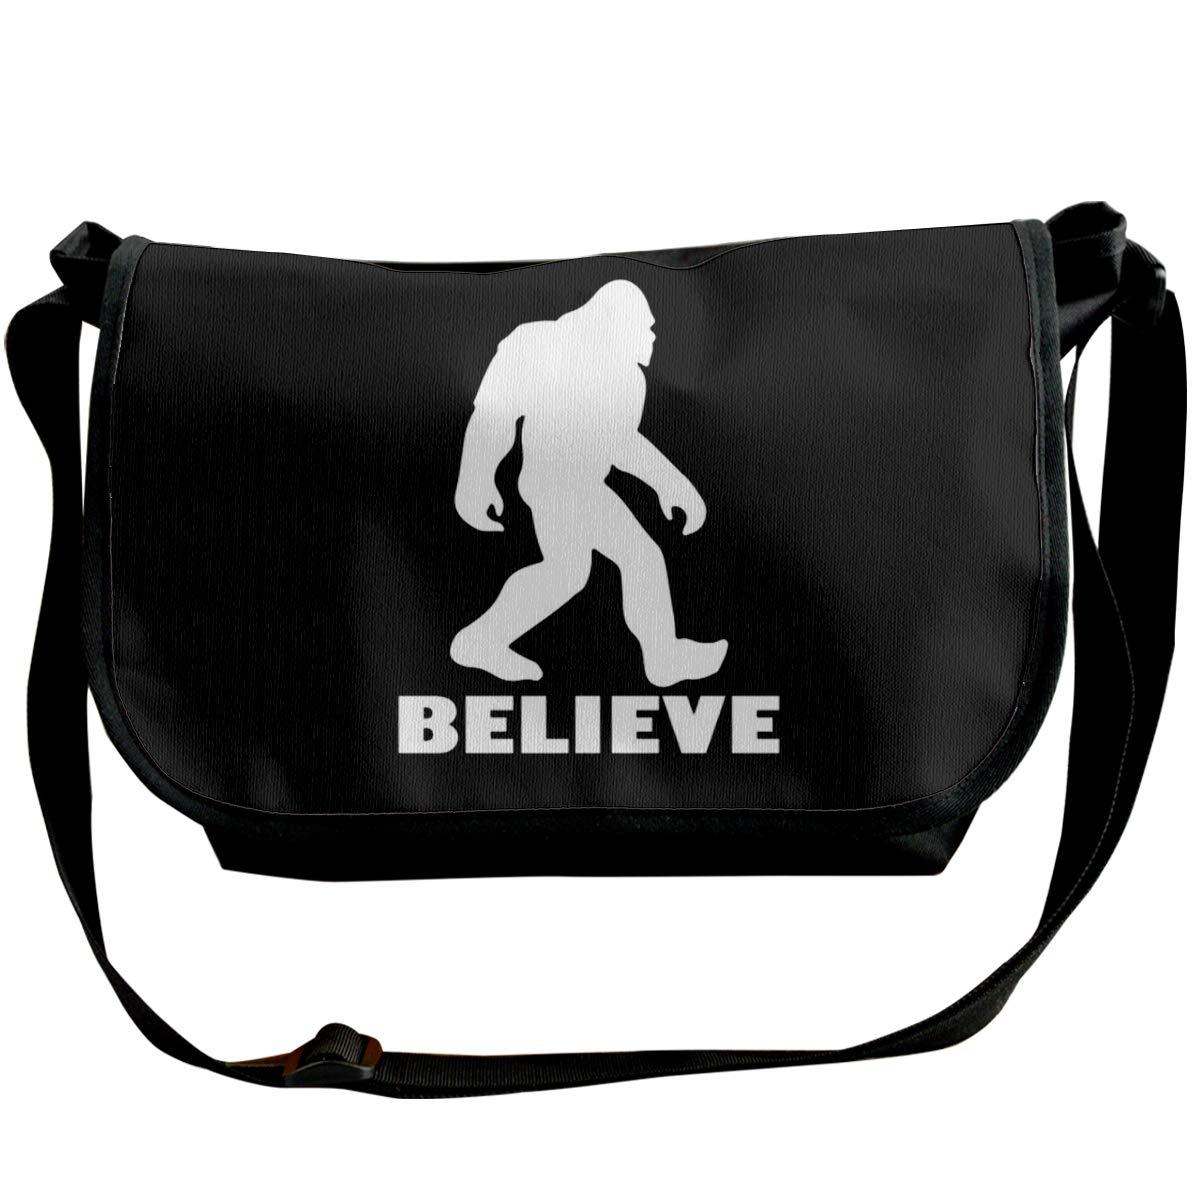 Futong Huaxia Bigfoot Silhouette Retro Travel Messenger Bags Handbag Shoulder Bag Crossbody Bag Unisex